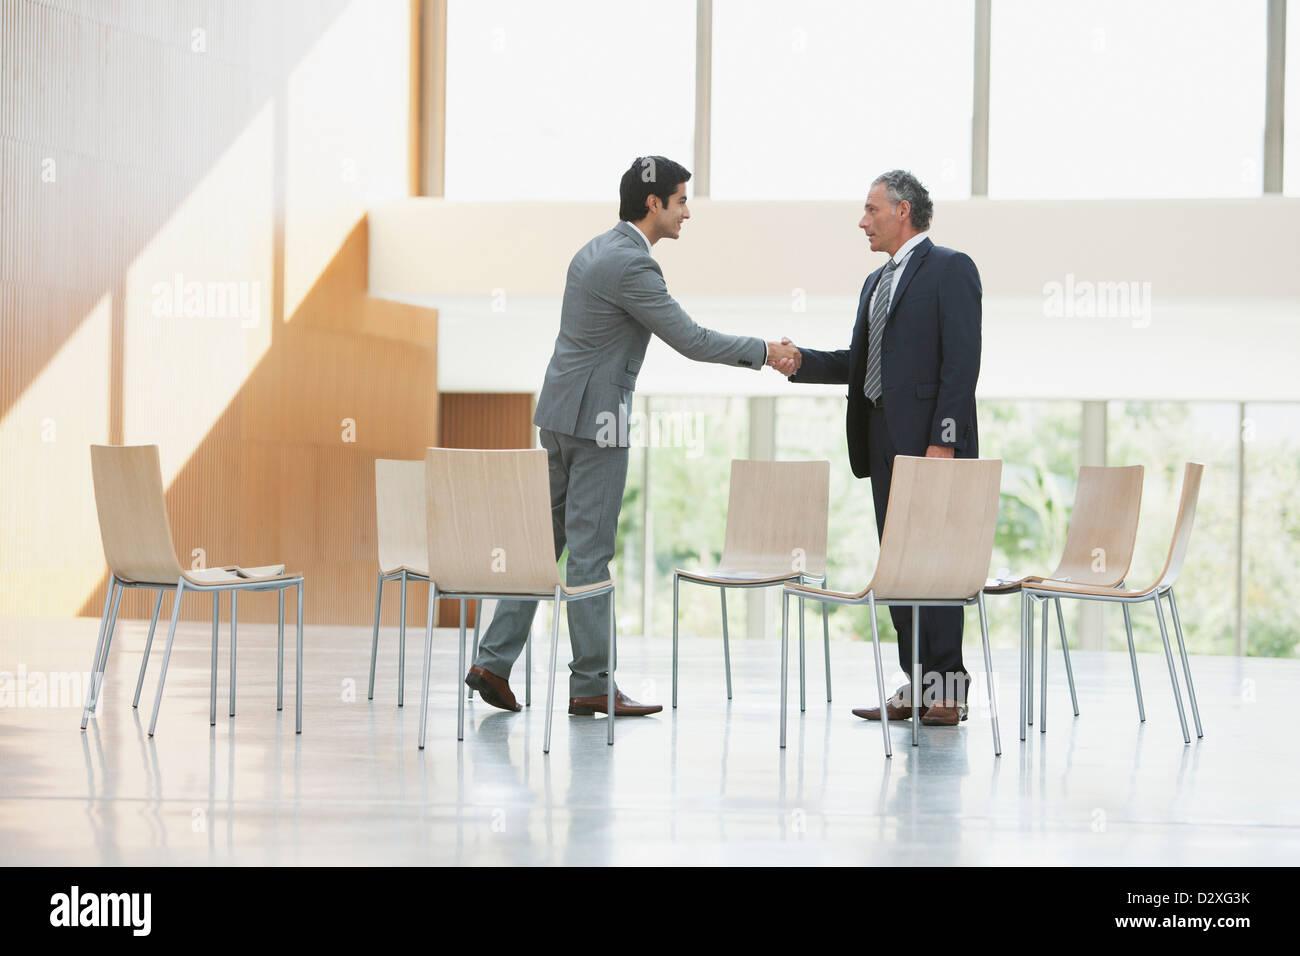 Chairs surrounding businessmen shaking hands - Stock Image